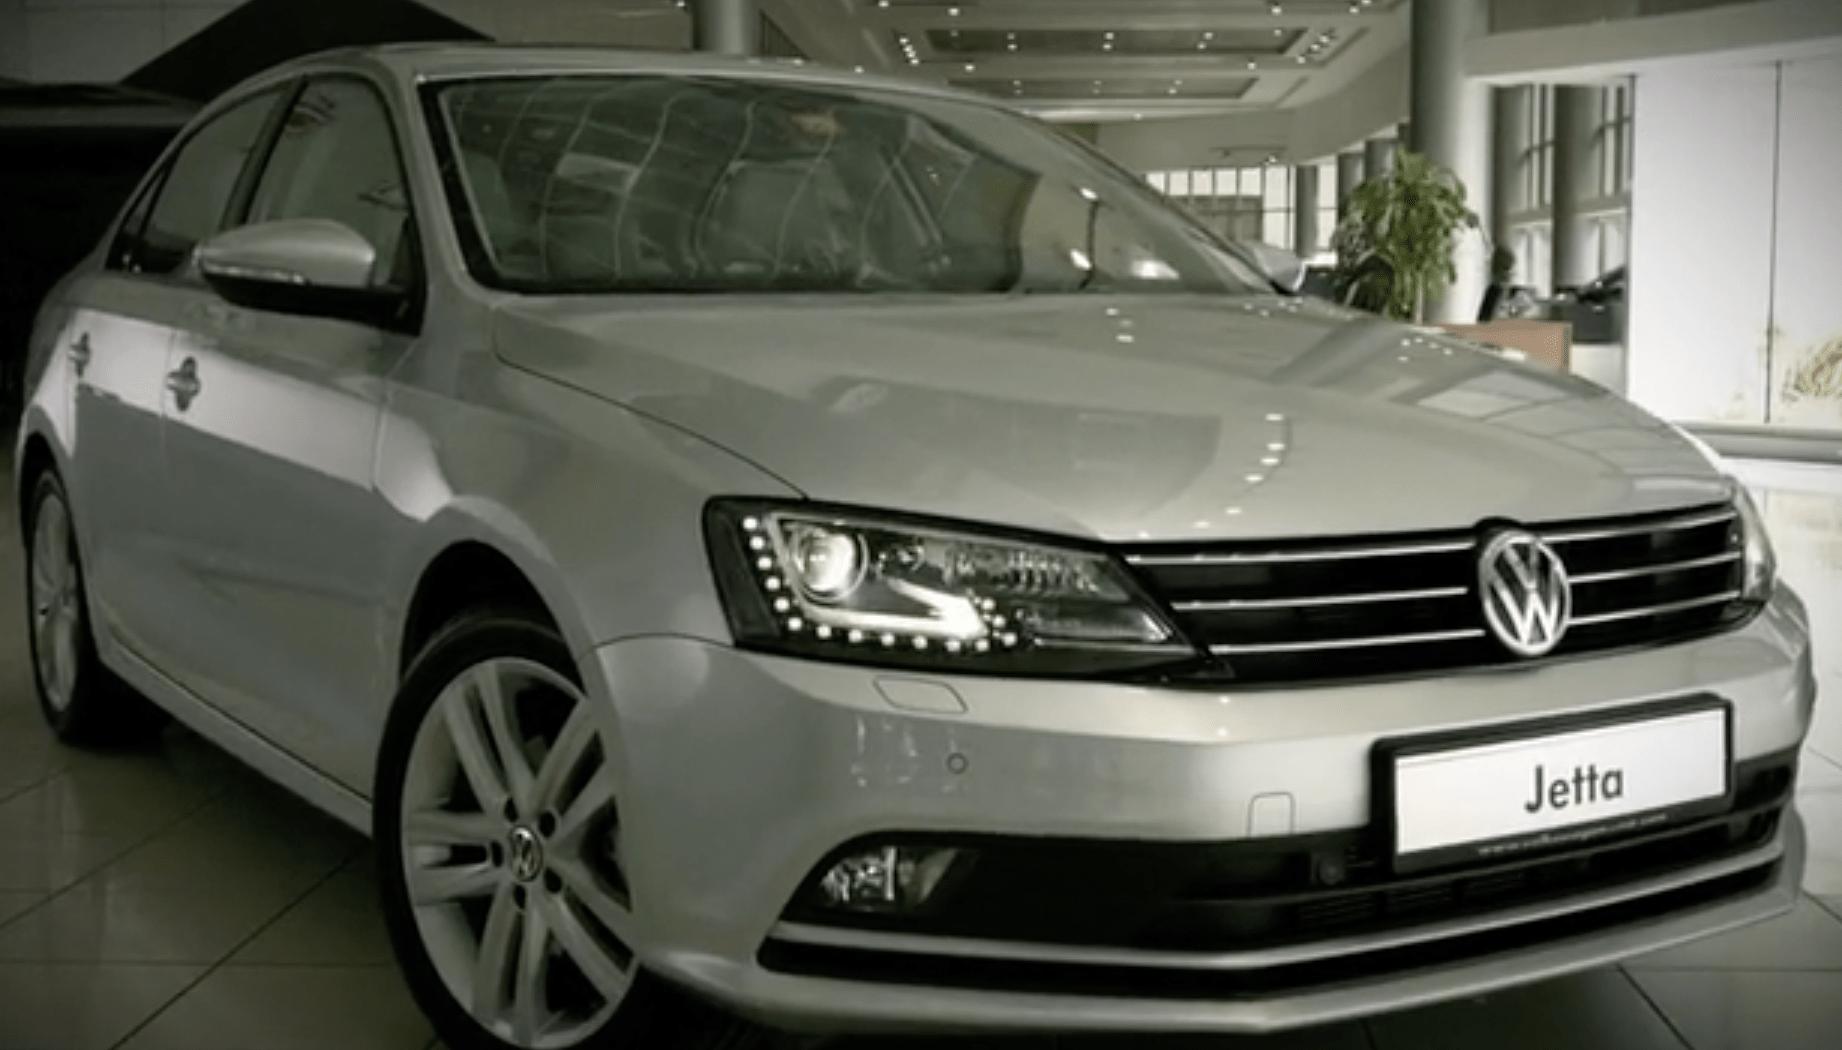 Video & Film Production Dubai - UAE - image Screen-Shot-2021-03-15-at-4.58.56-PM on https://www.kalideme.com